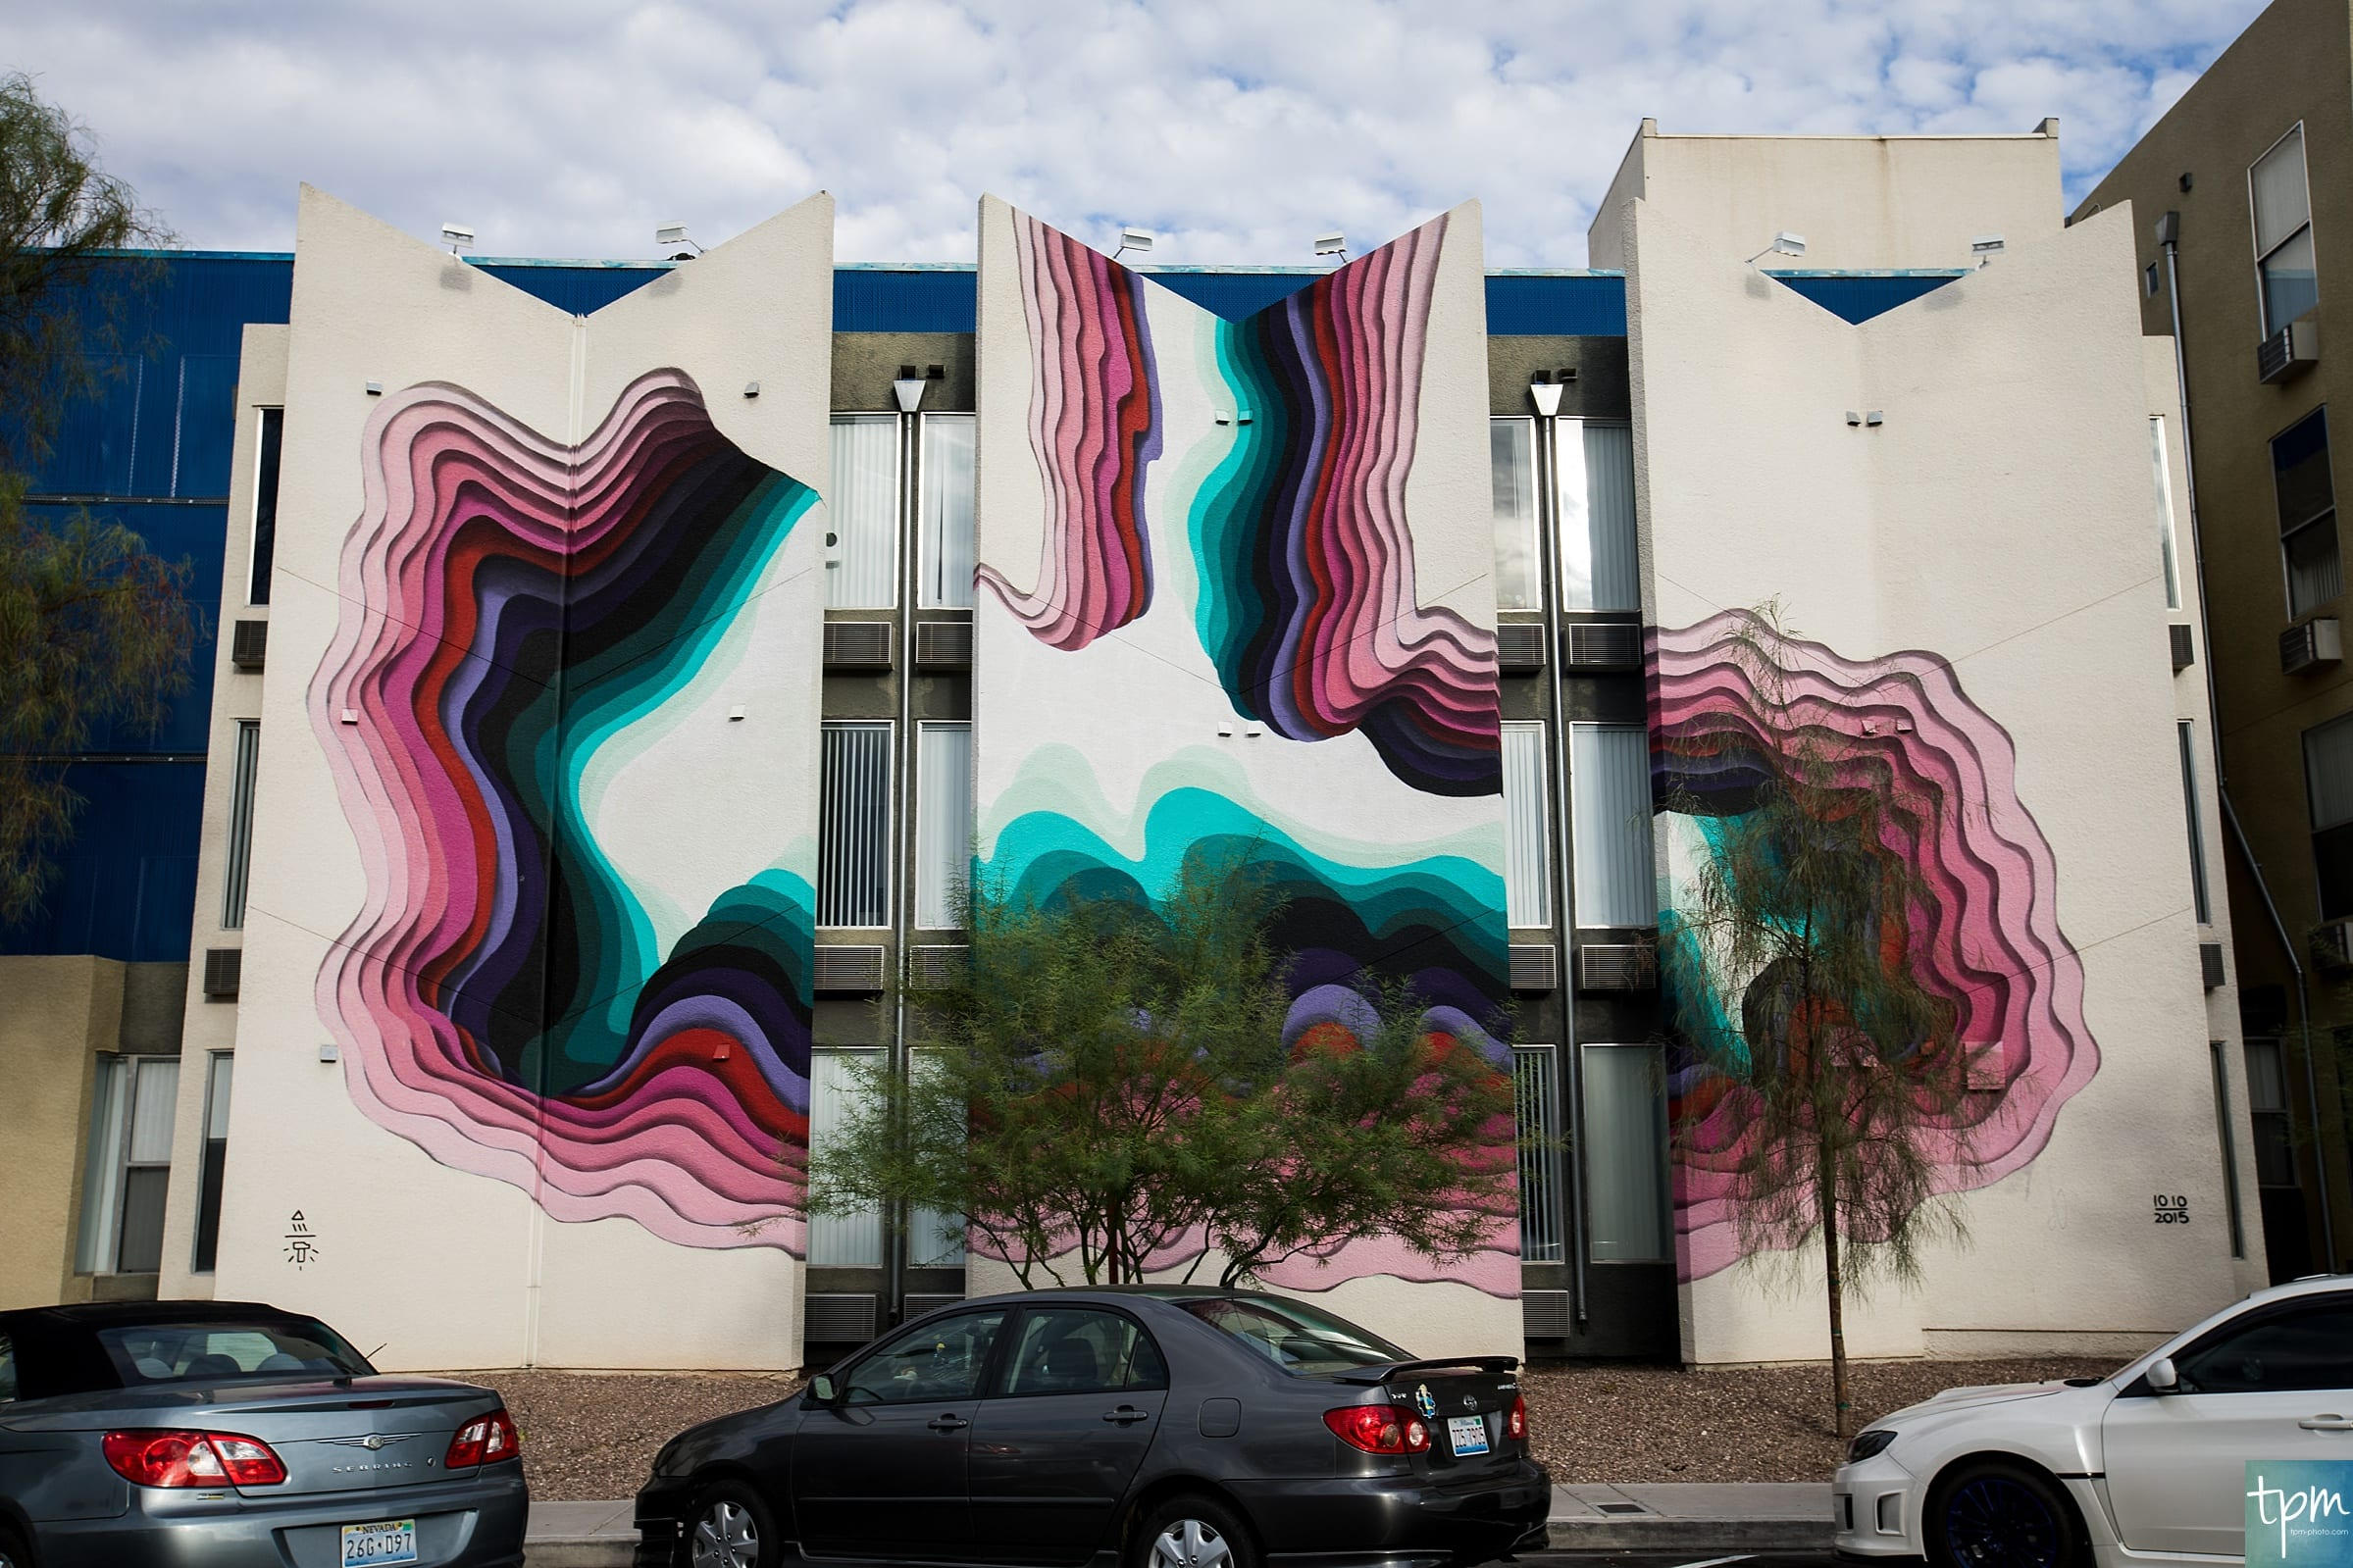 Las Vegas Murals The Most Comprehensive Guide Las Vegas Photographers Taylored Photo Memories